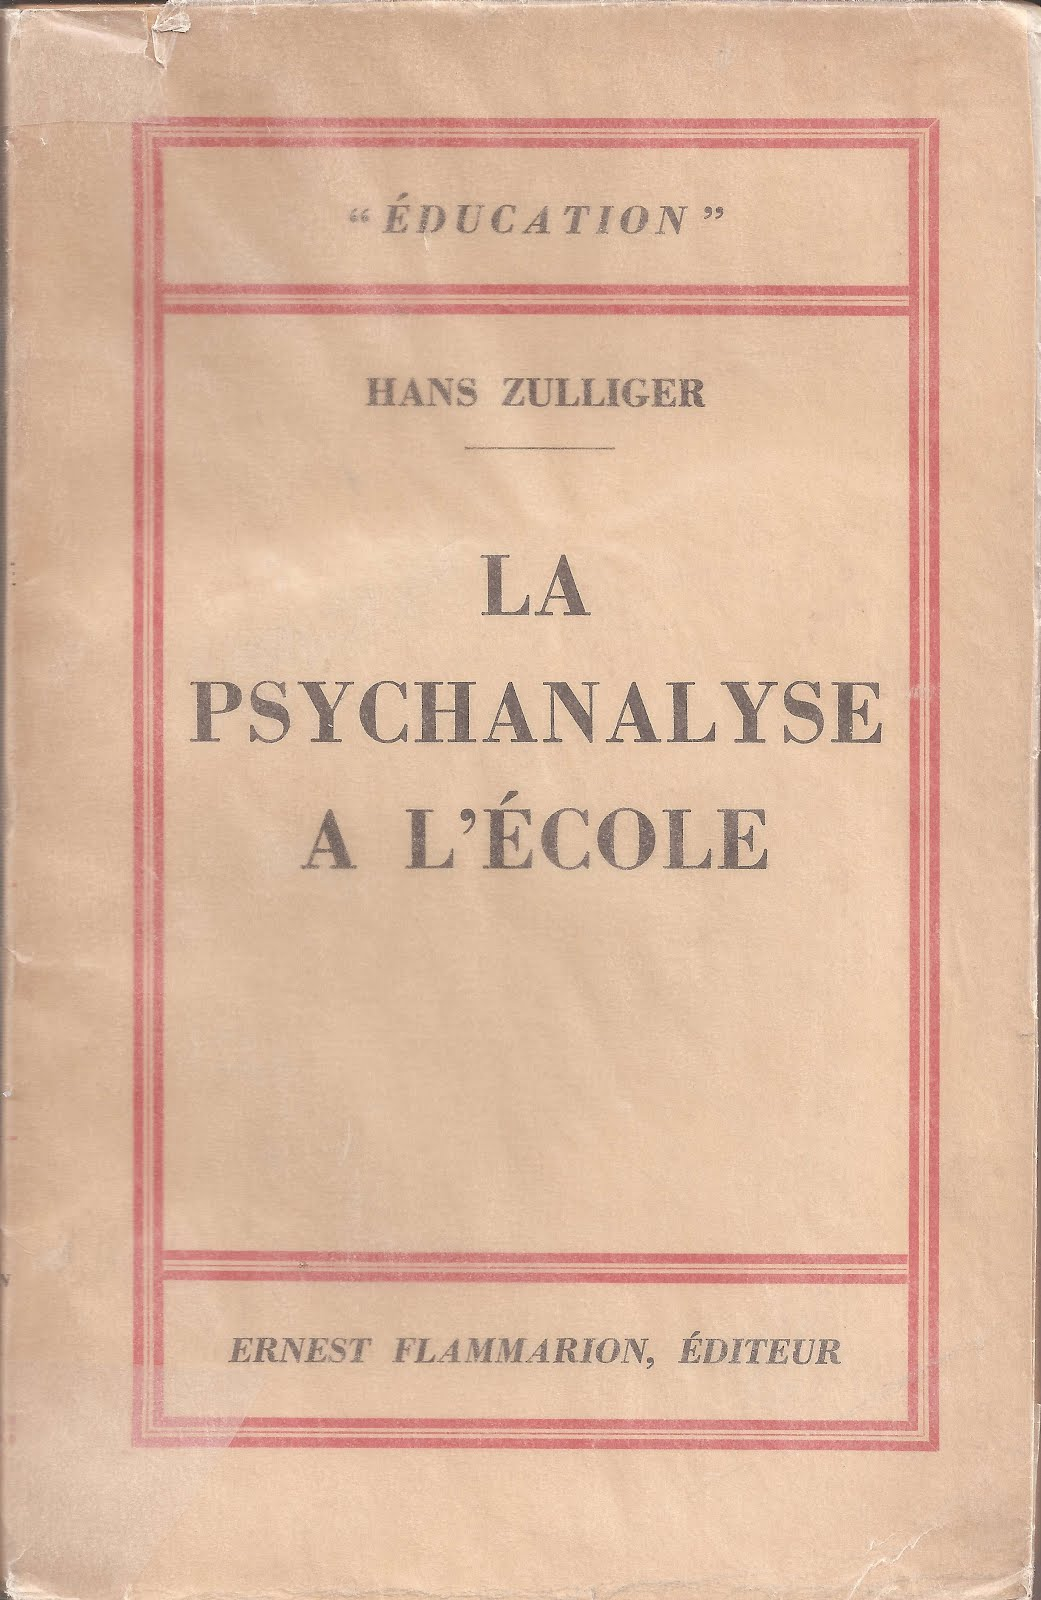 Hans ZULLIGER, 1er psychopédagogue?